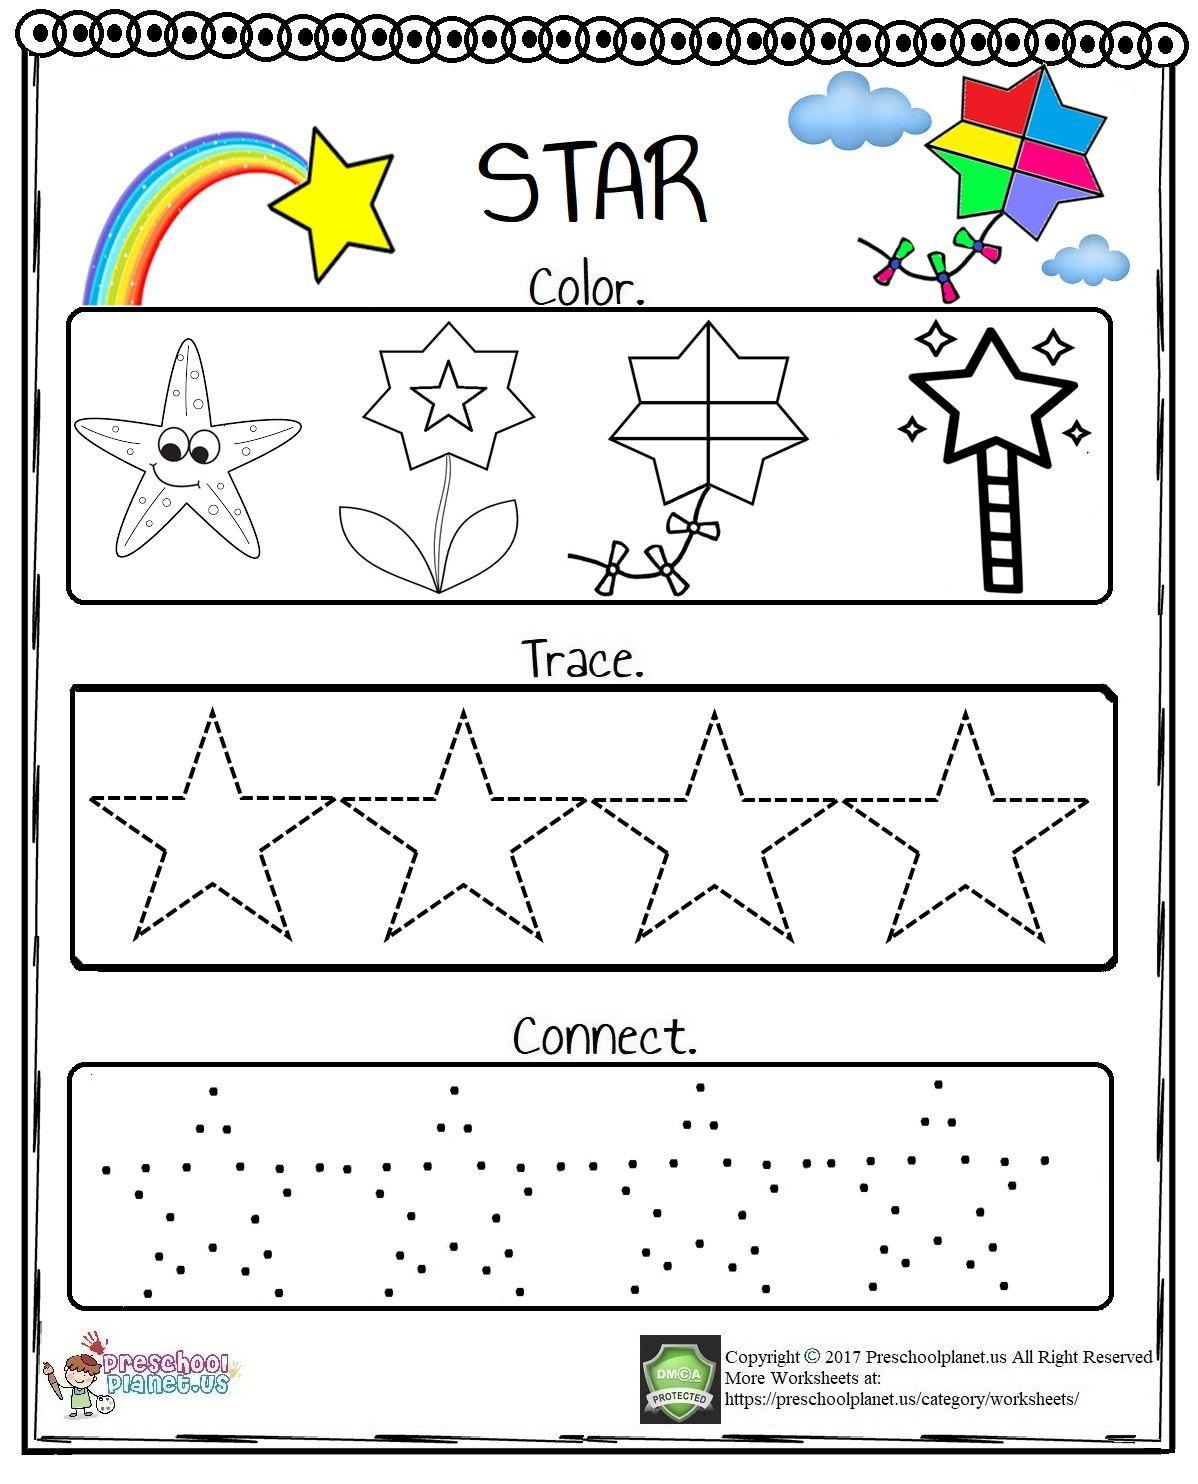 Star Worksheet Twinkle twinkle little star, how I wonder